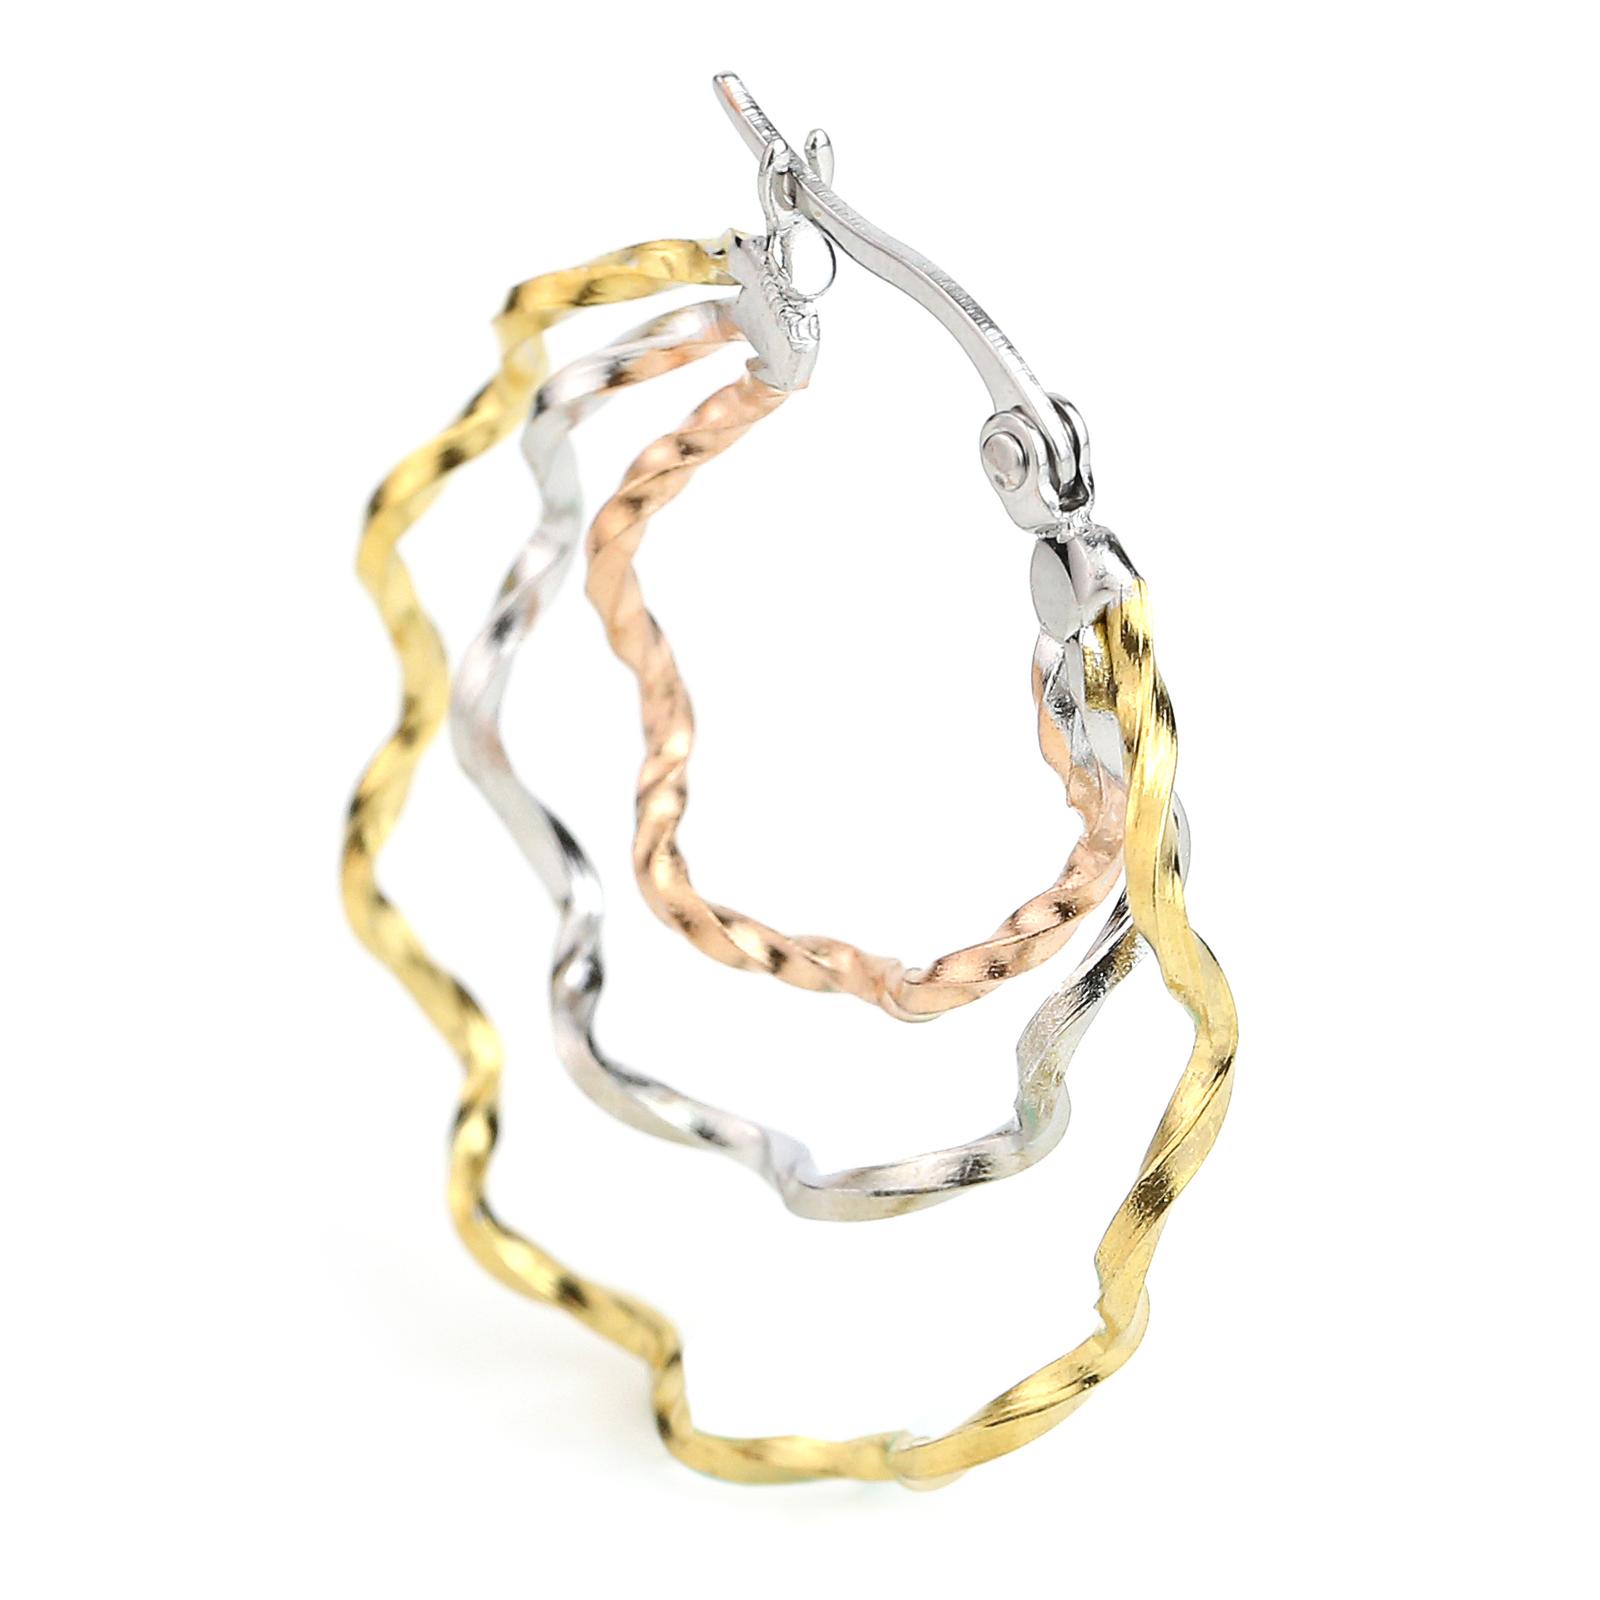 Whimsical Tri-Color Silver, Gold & Rose Tone Hoop Earrings- United Elegance image 2